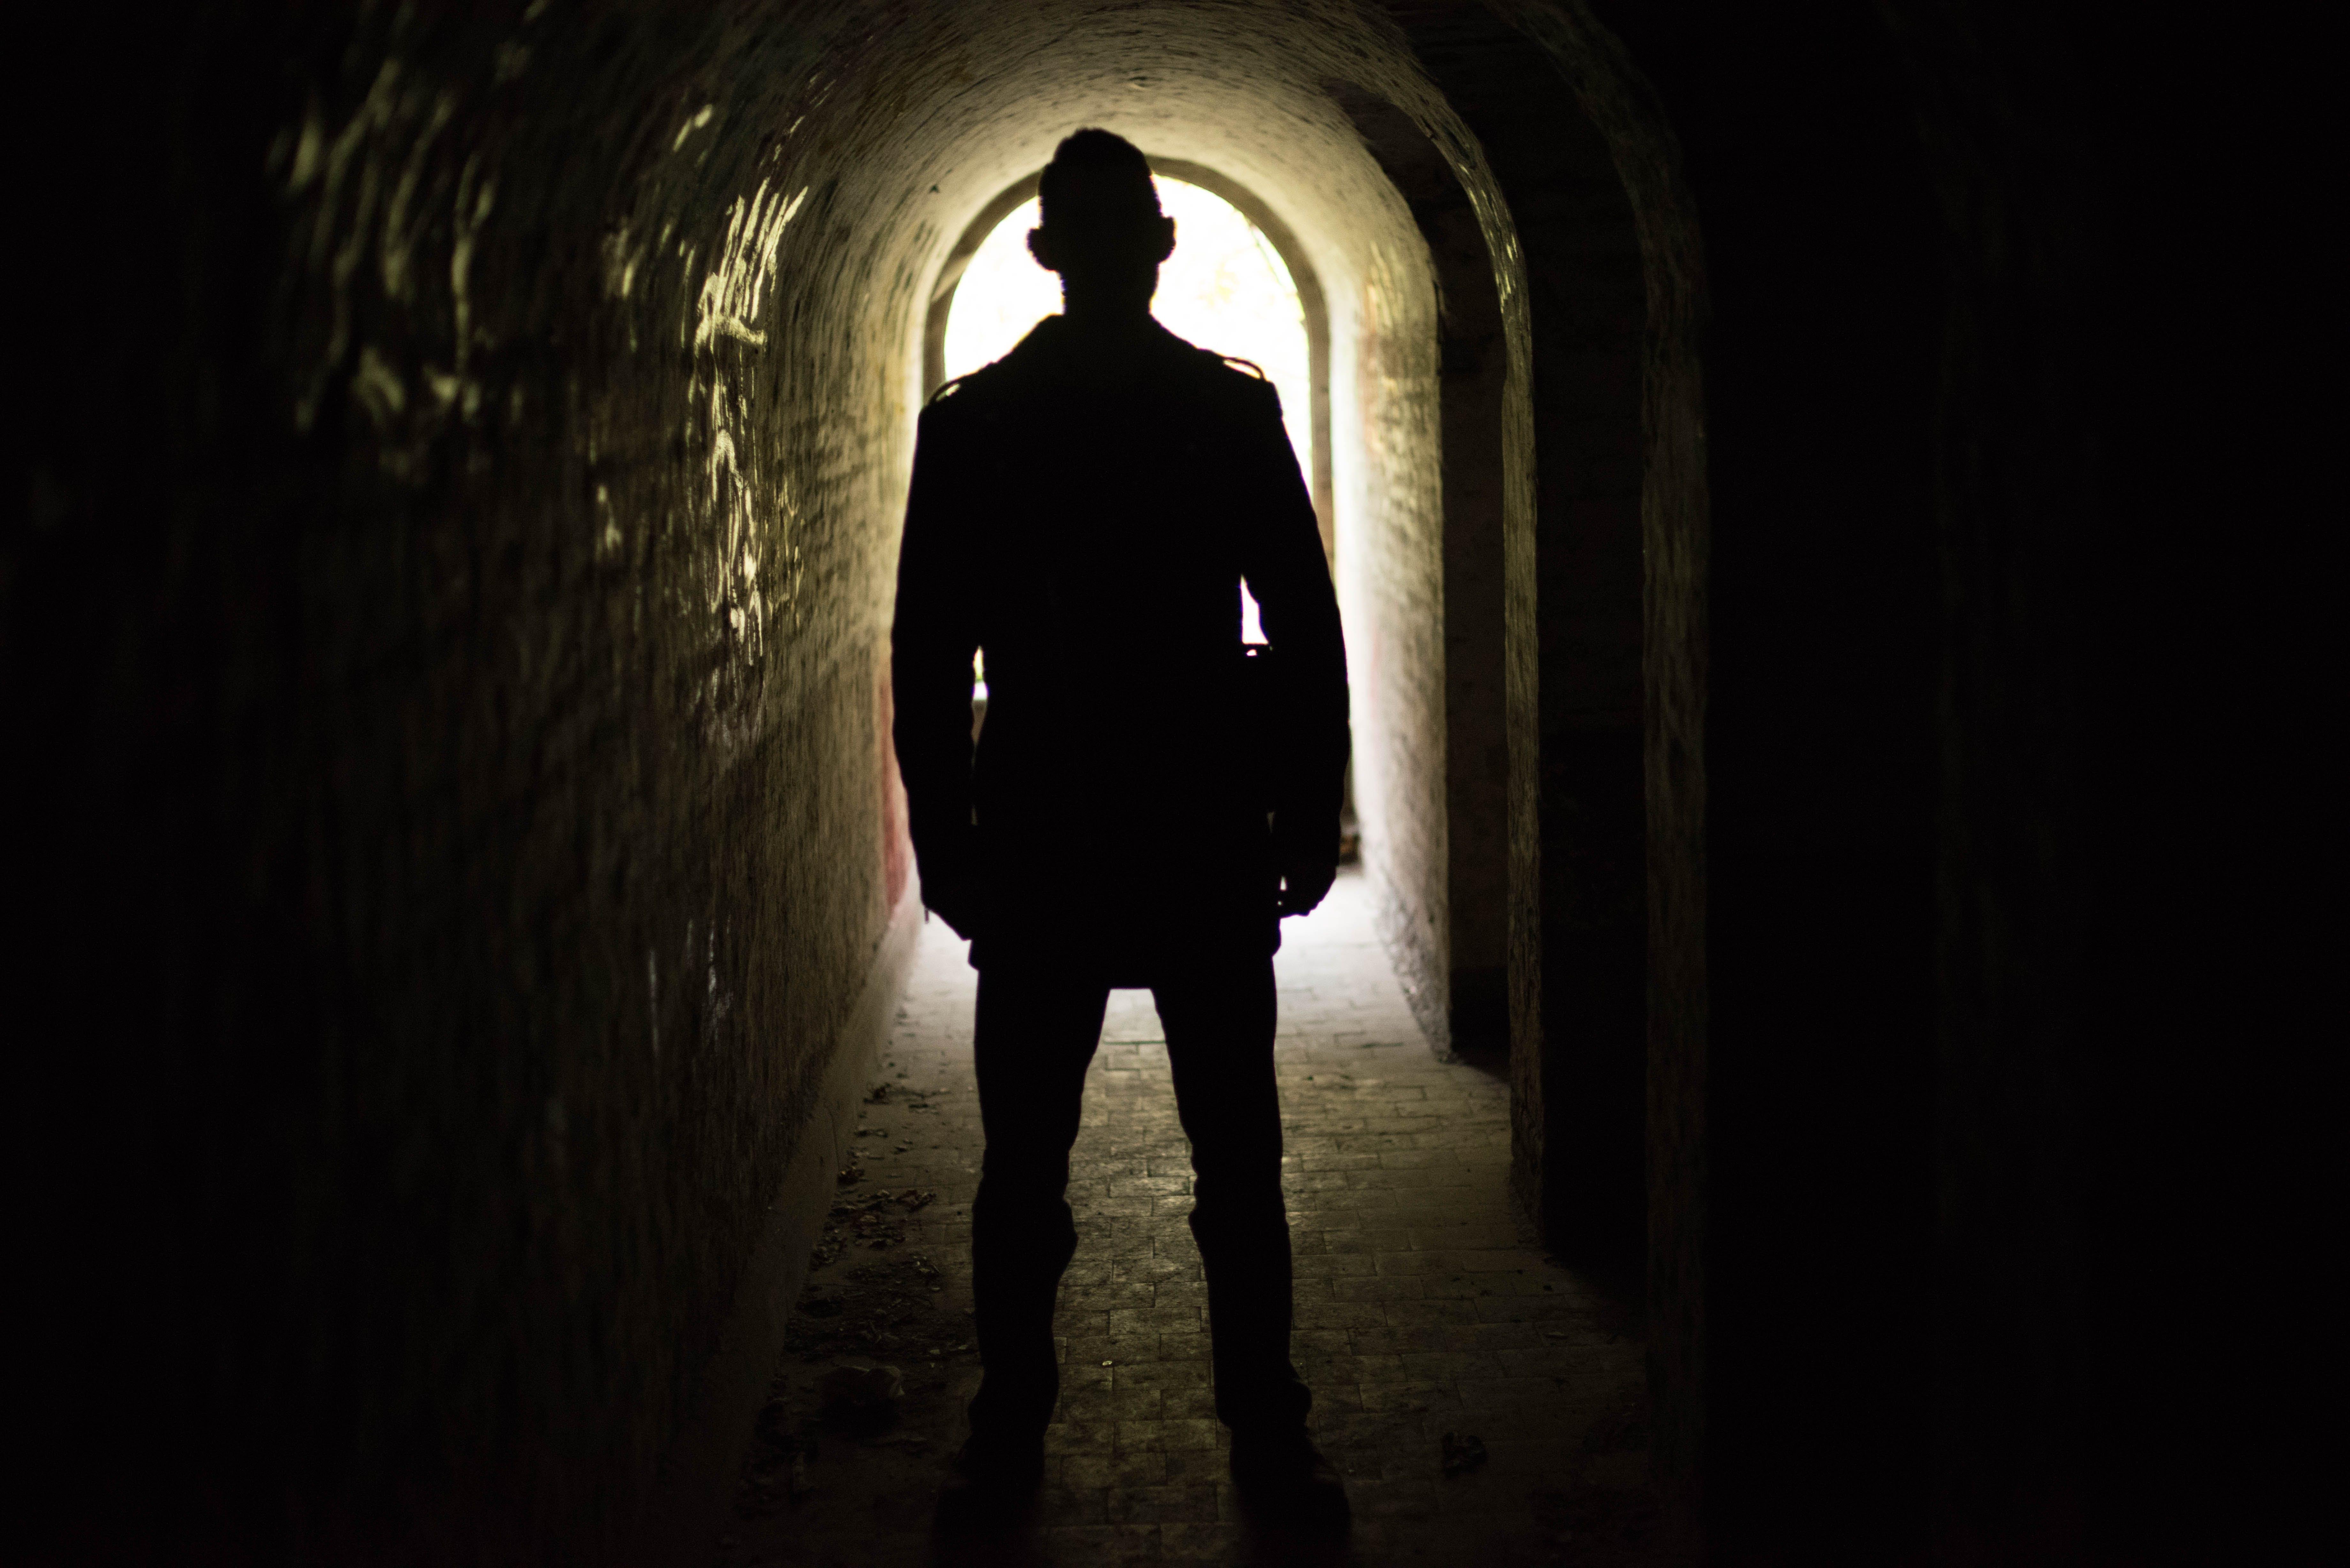 Free stock photo of light, man, person, dark